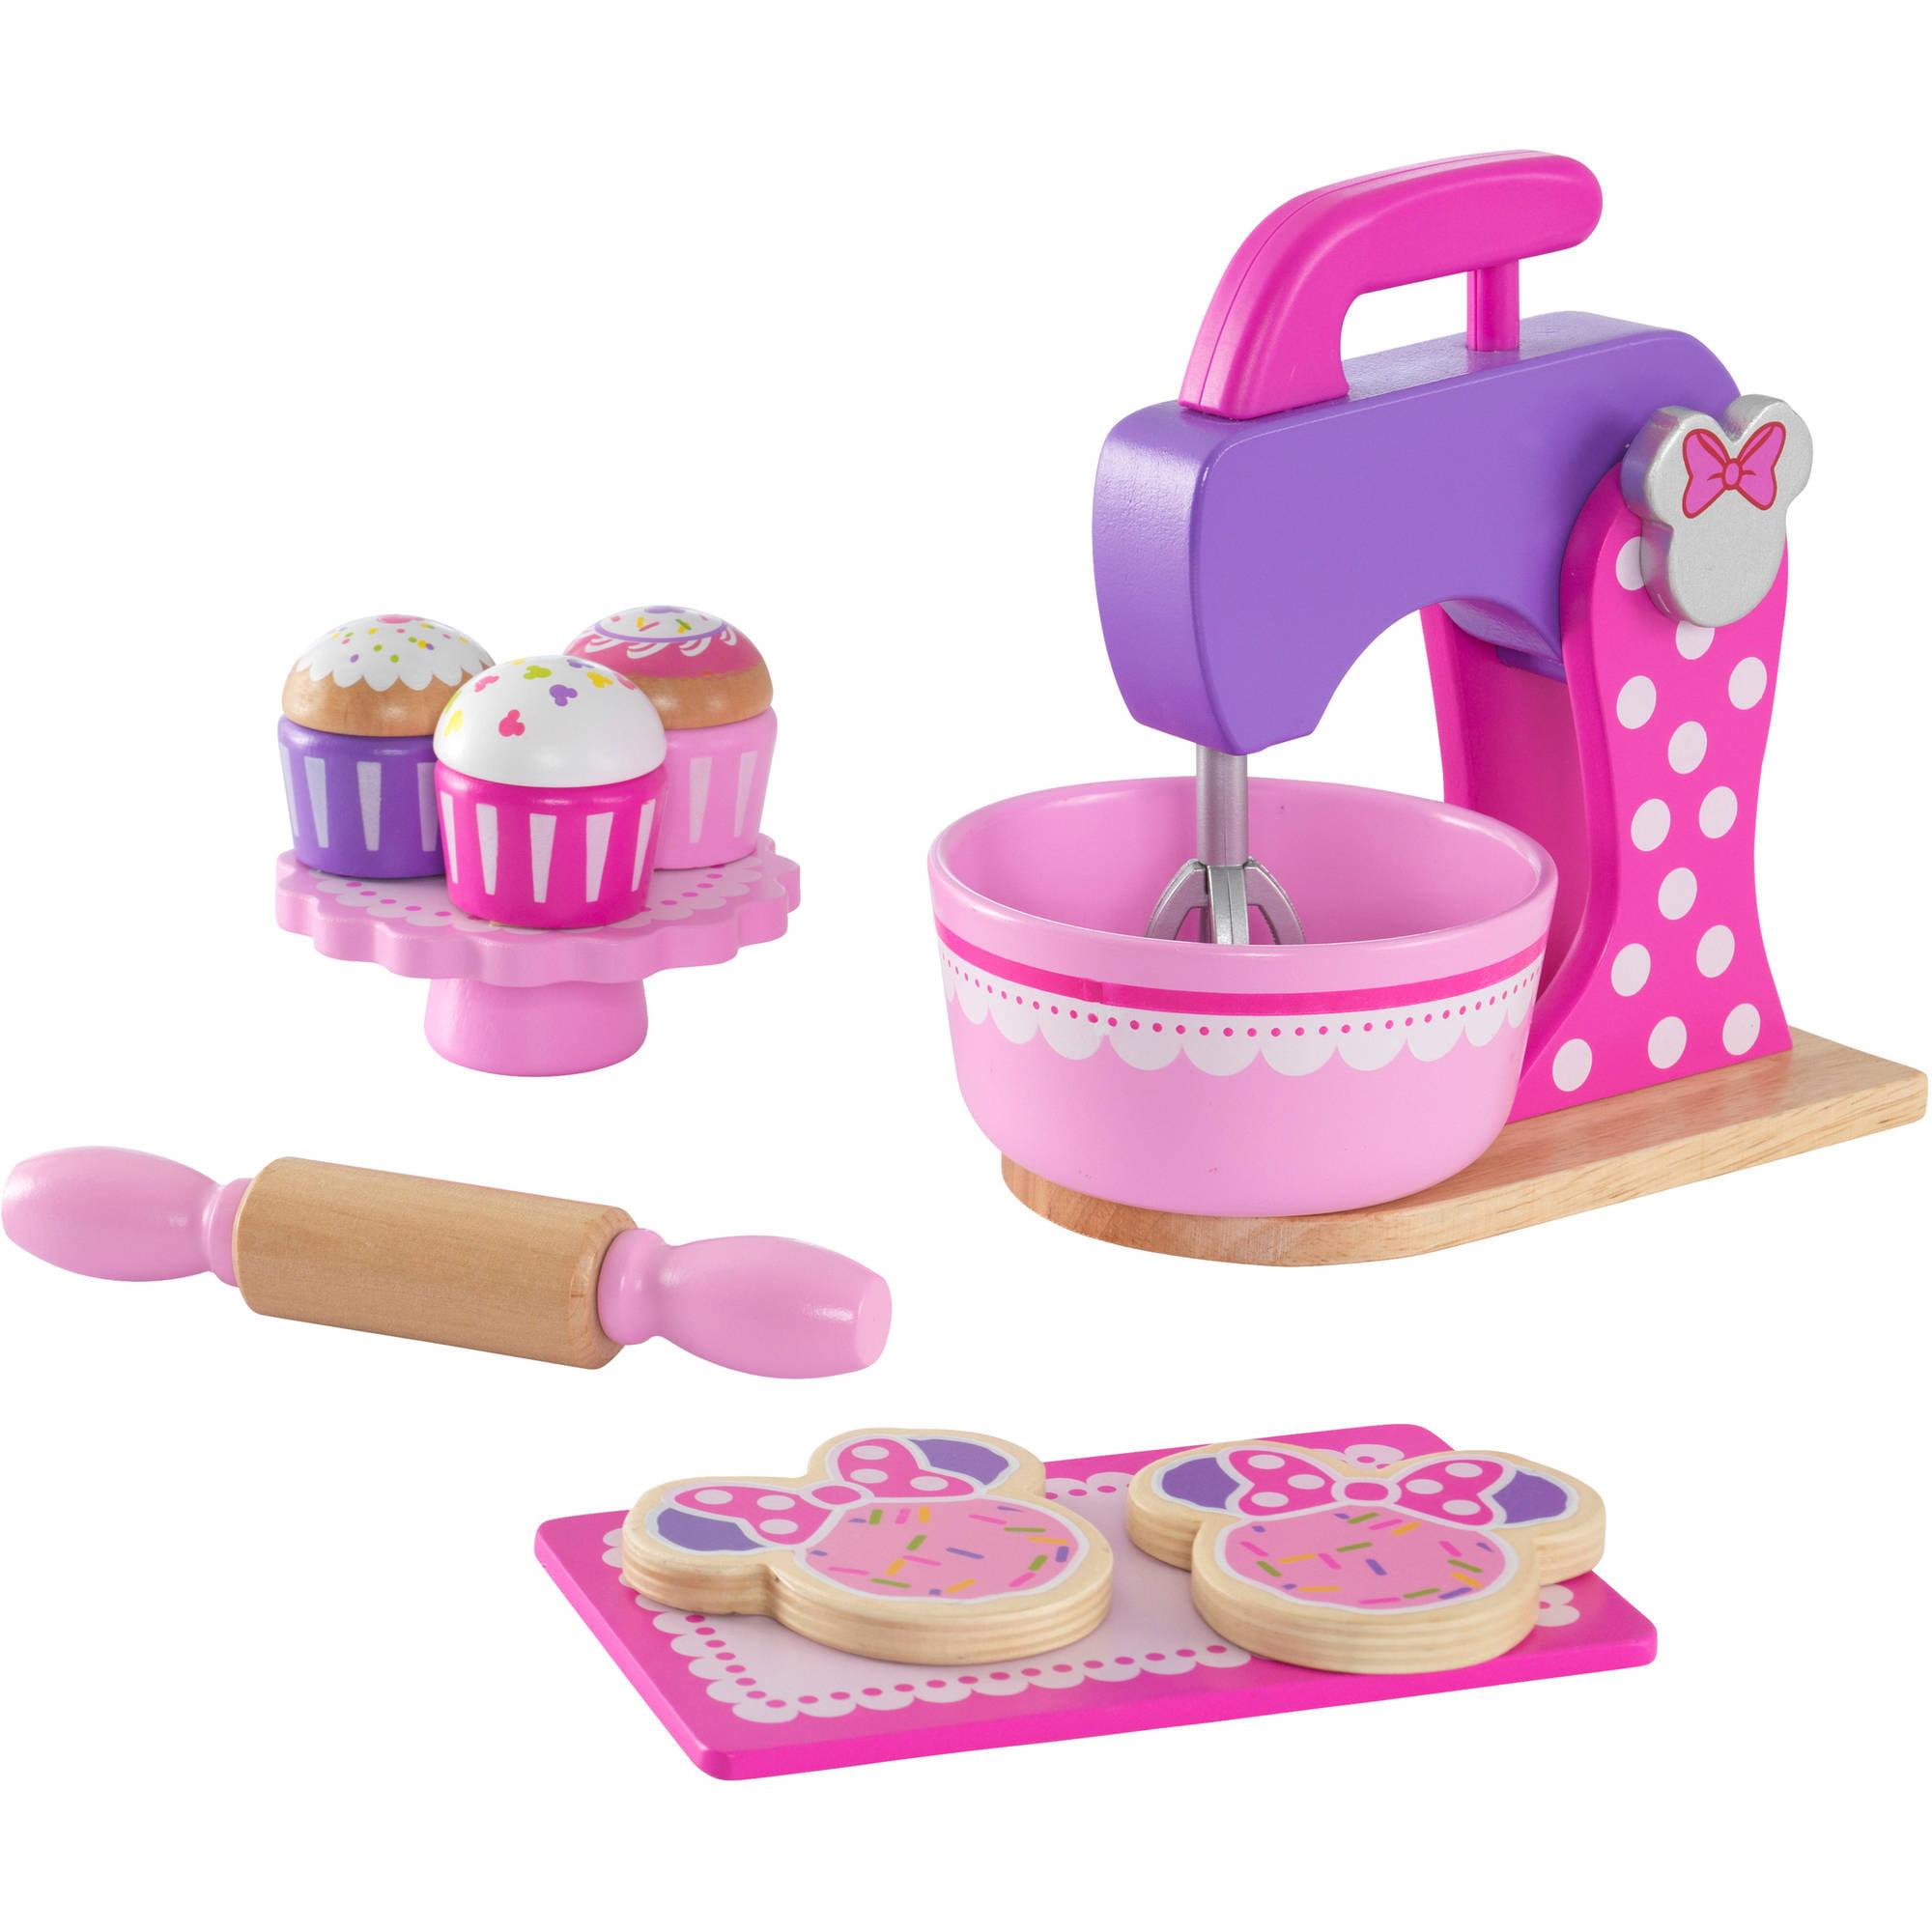 Deluxe Minnie Mouse Baking Set + Treats, Pink by KidKraft by KidKraft